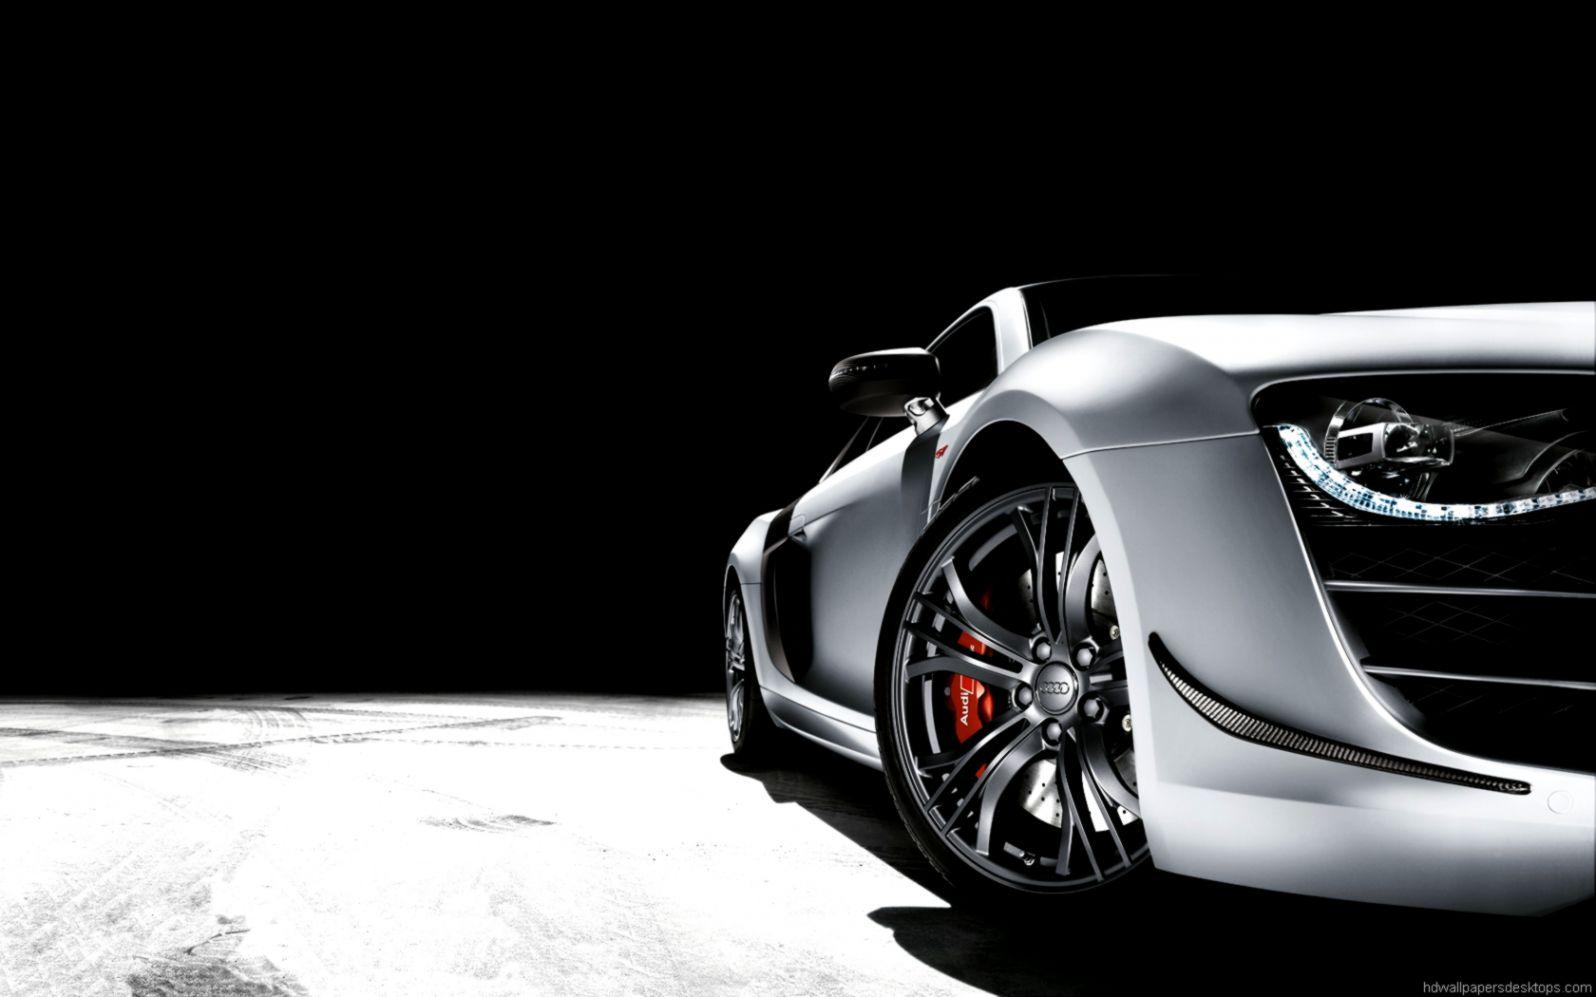 Cars Wallpaper Hd 1080P